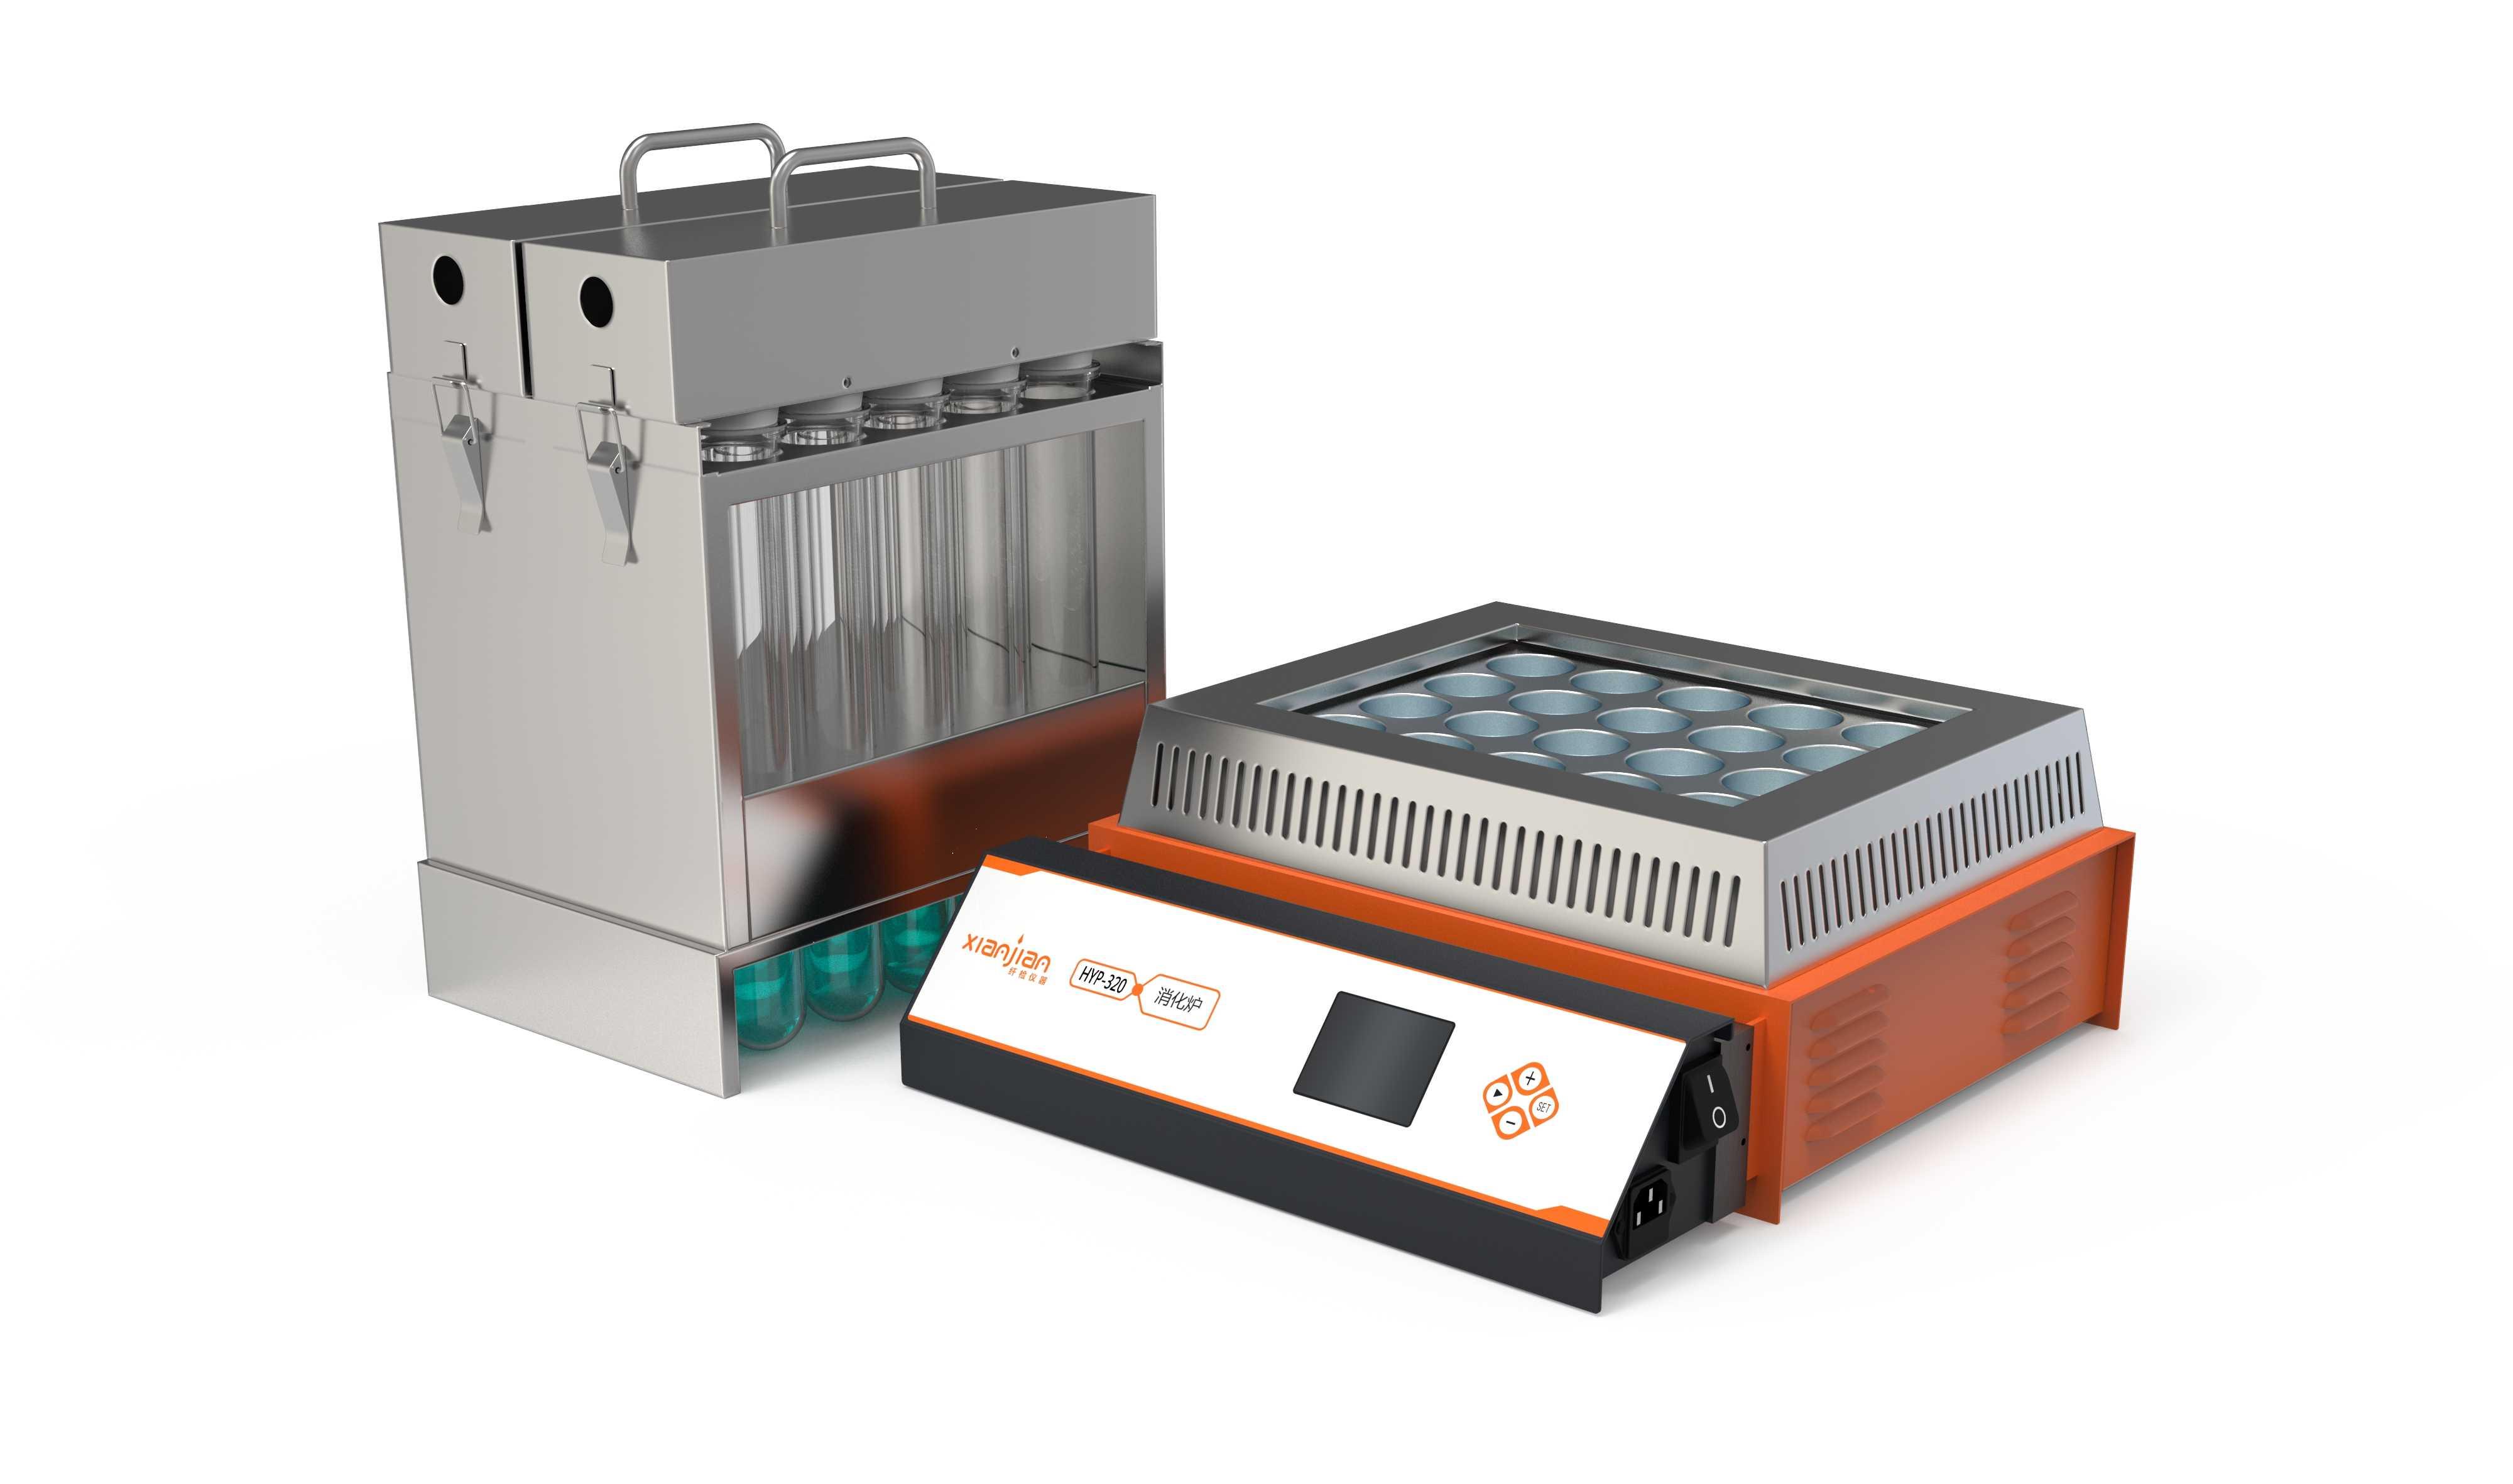 HYP-320二十孔智能消化炉